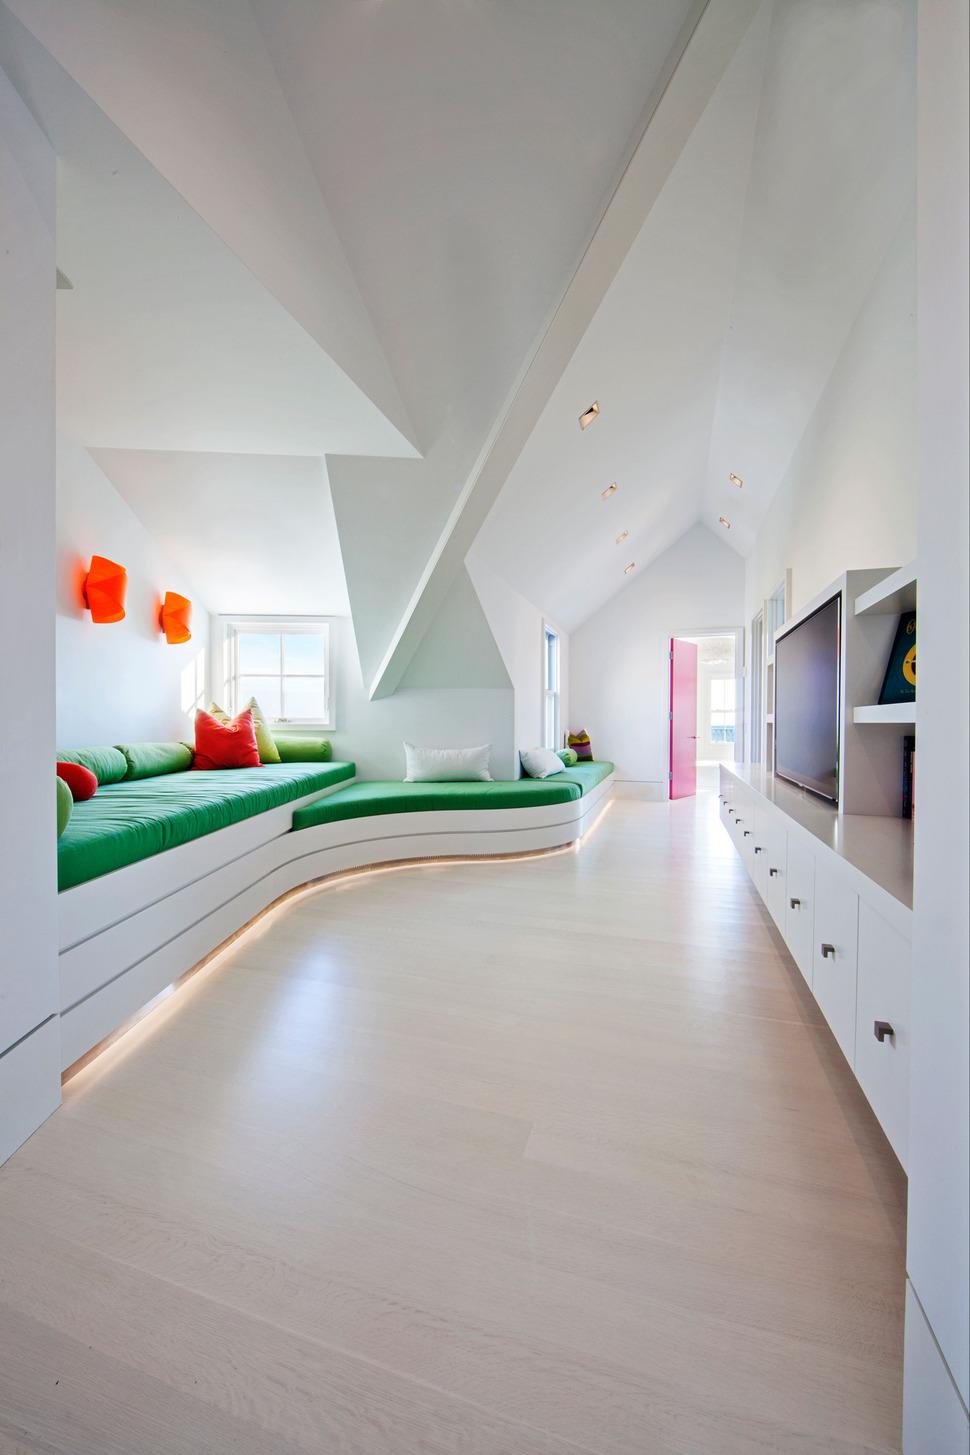 Rumpus Room Design Ideas Part - 21: View In Gallery Traditional-exterior-hides-colourfully-contemporary-interior -25-rumpusroom.